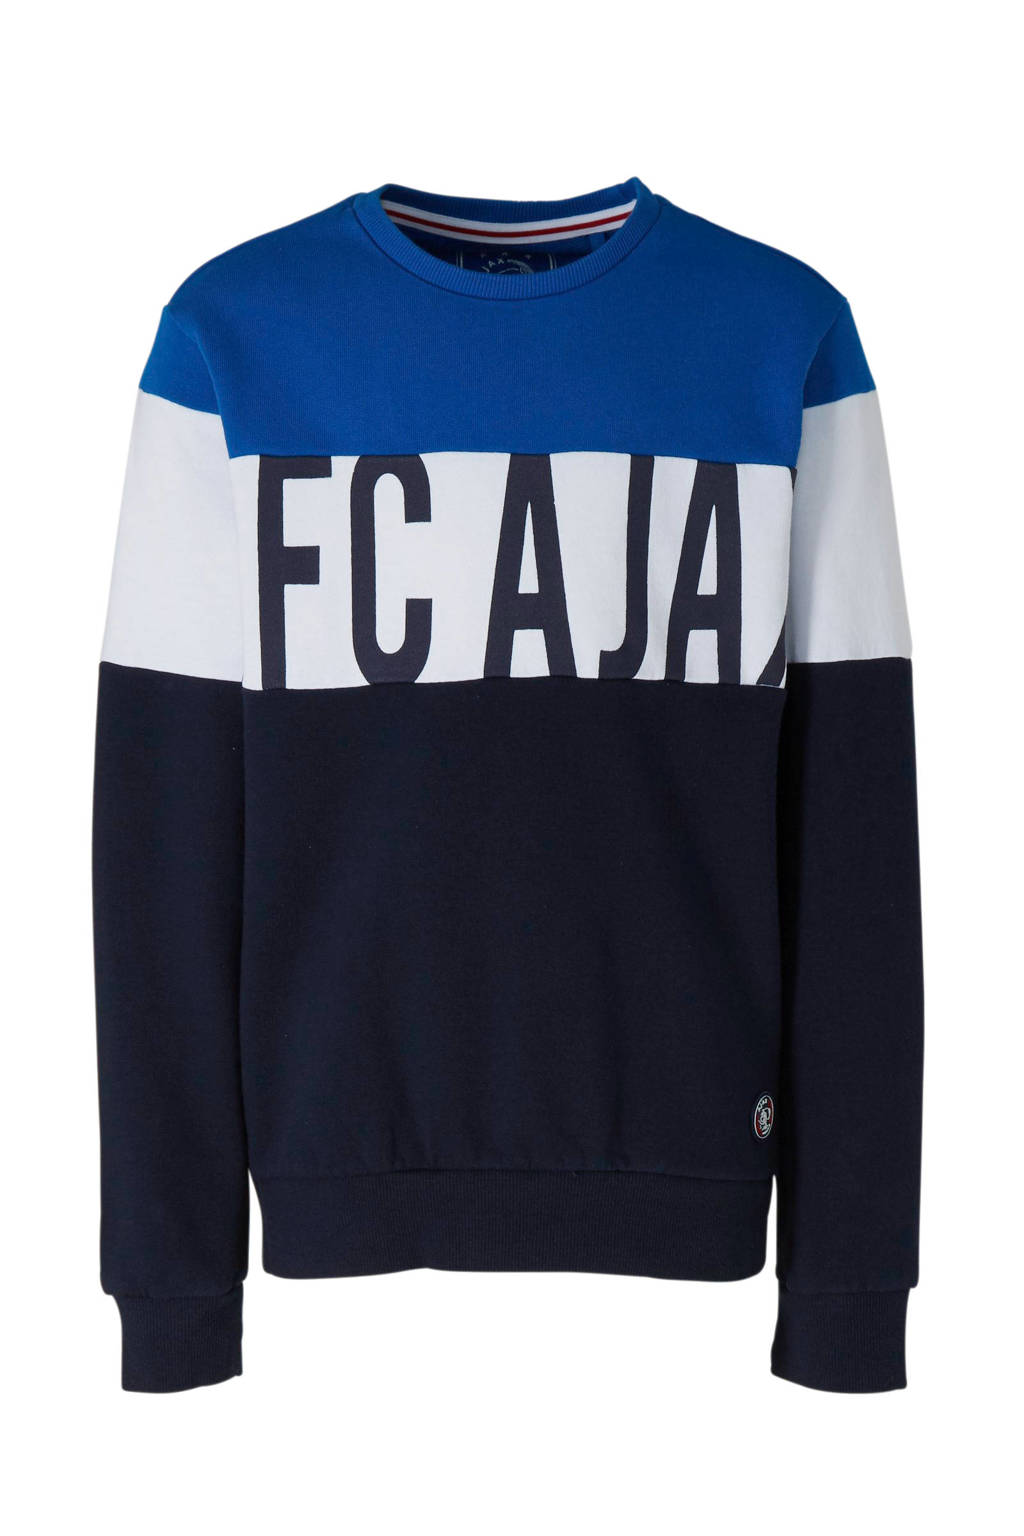 Ajax sweater met logo donkerblauw, Donkerblauw/blauw/wit